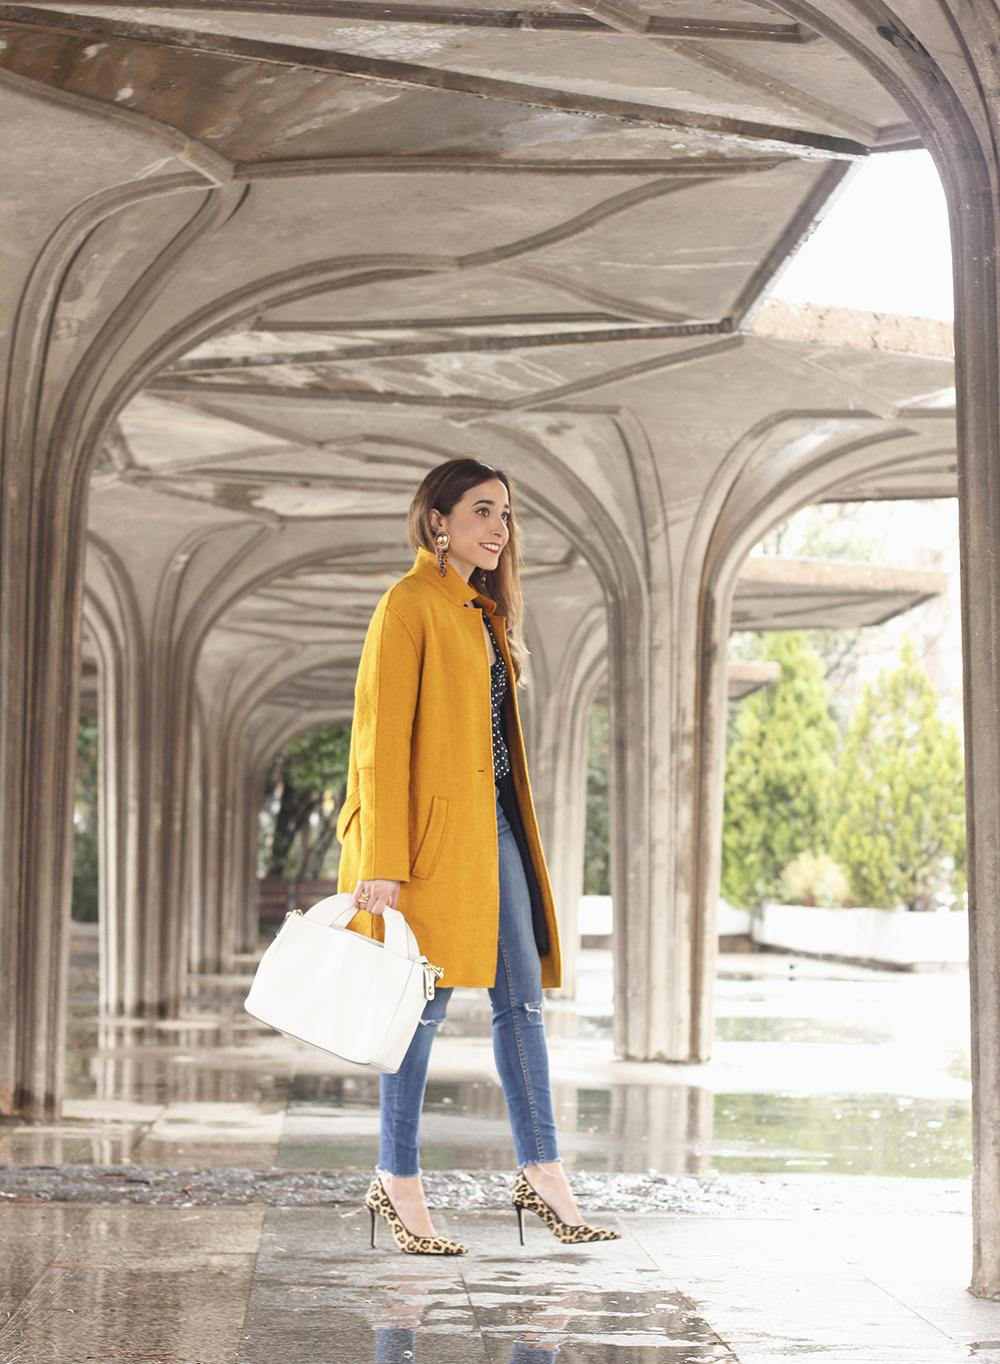 mustard coat polka dots shirt leopard heels white bag outfit 01